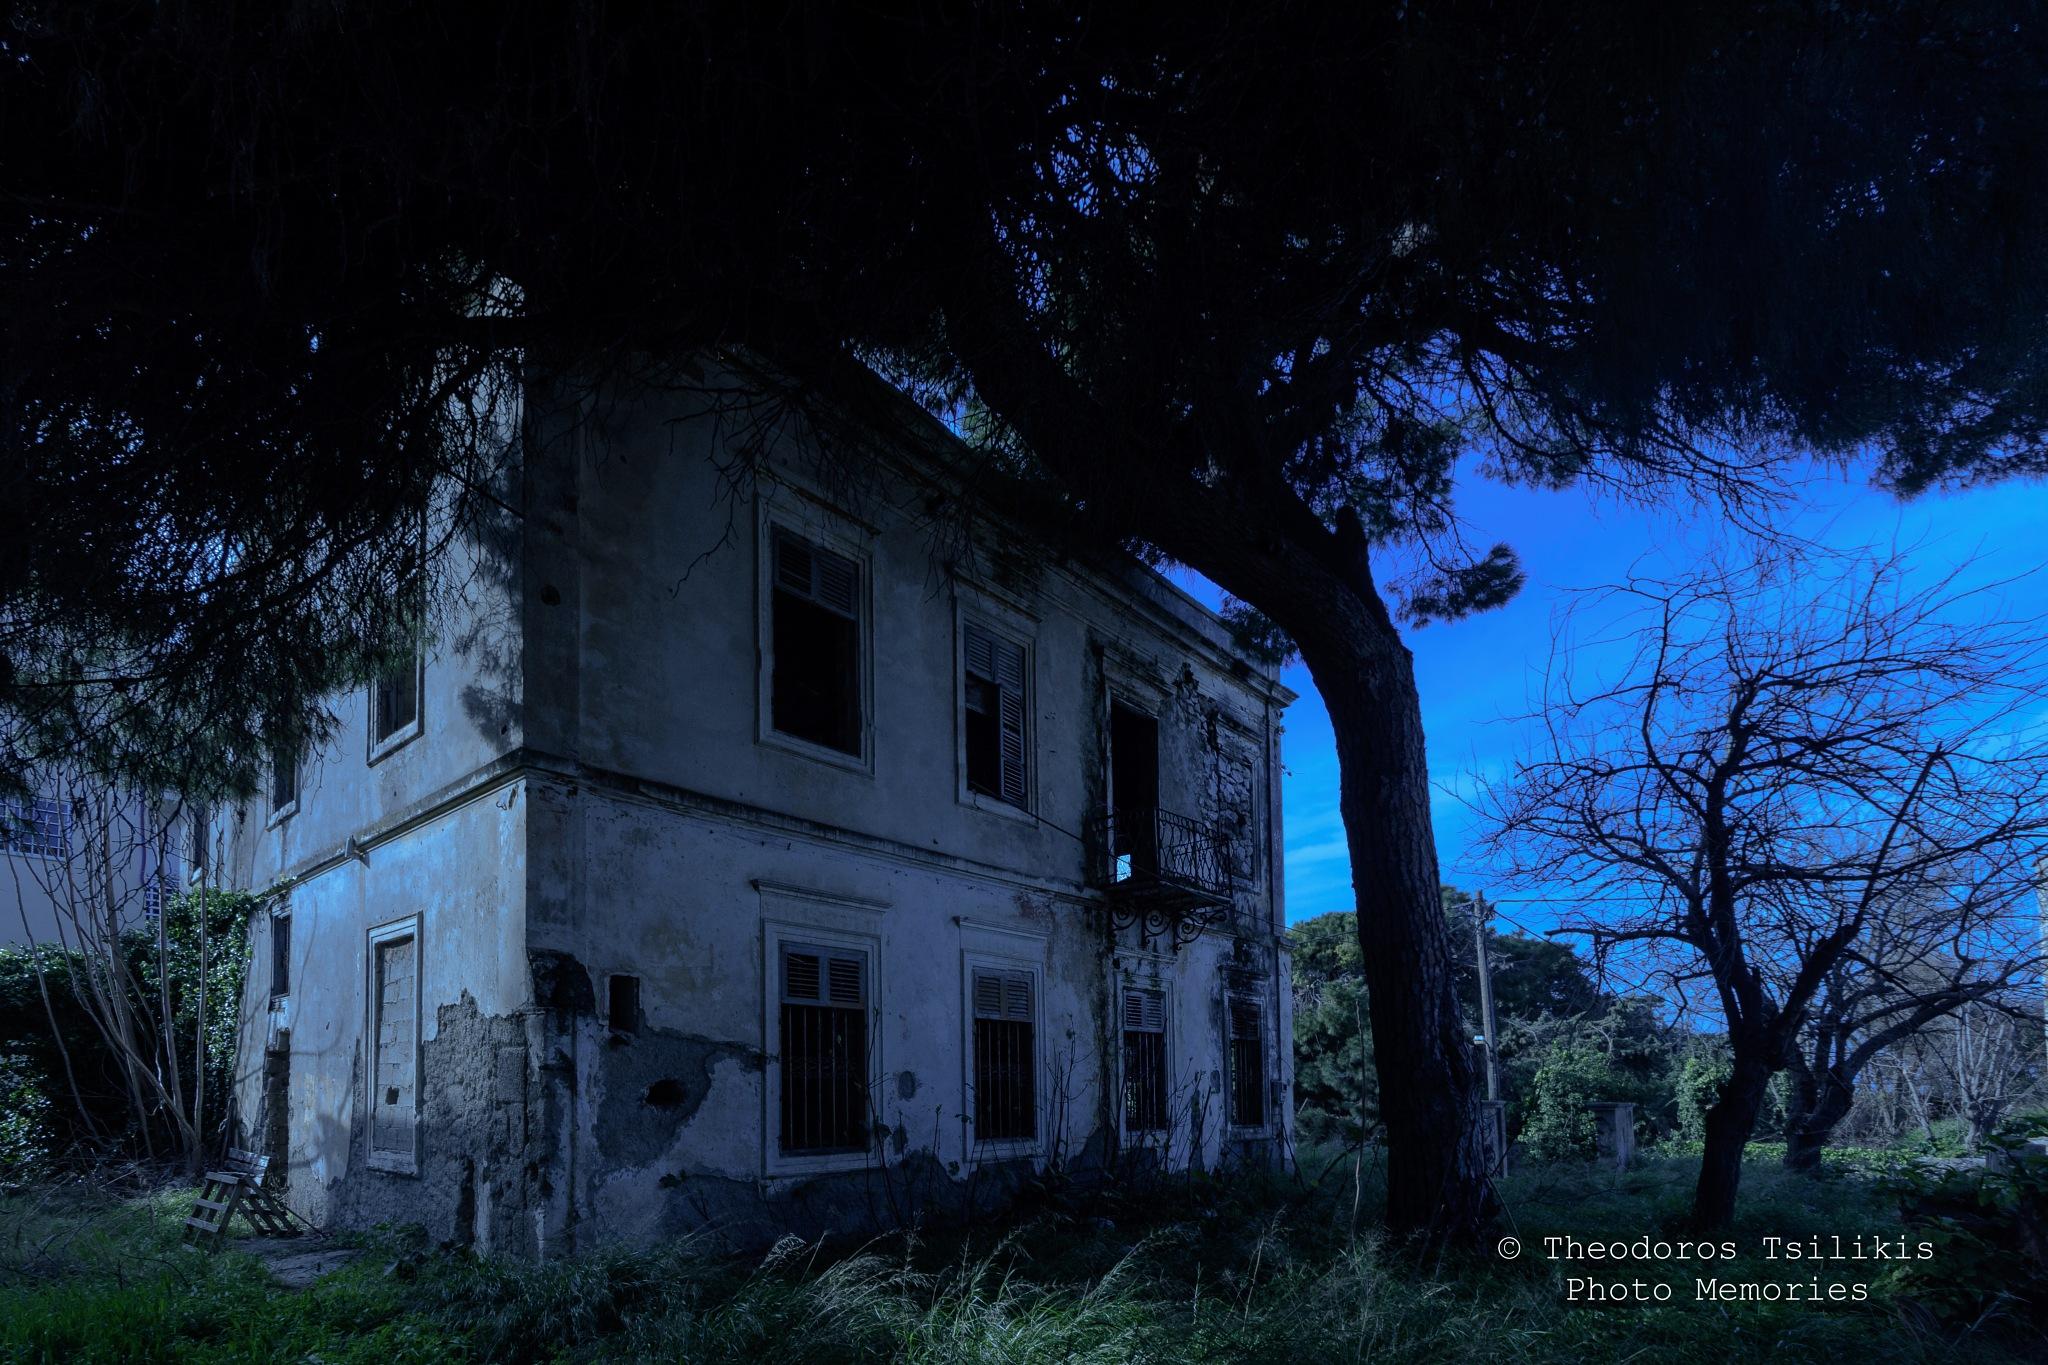 Nightmare house by Theodoros Tsilikis